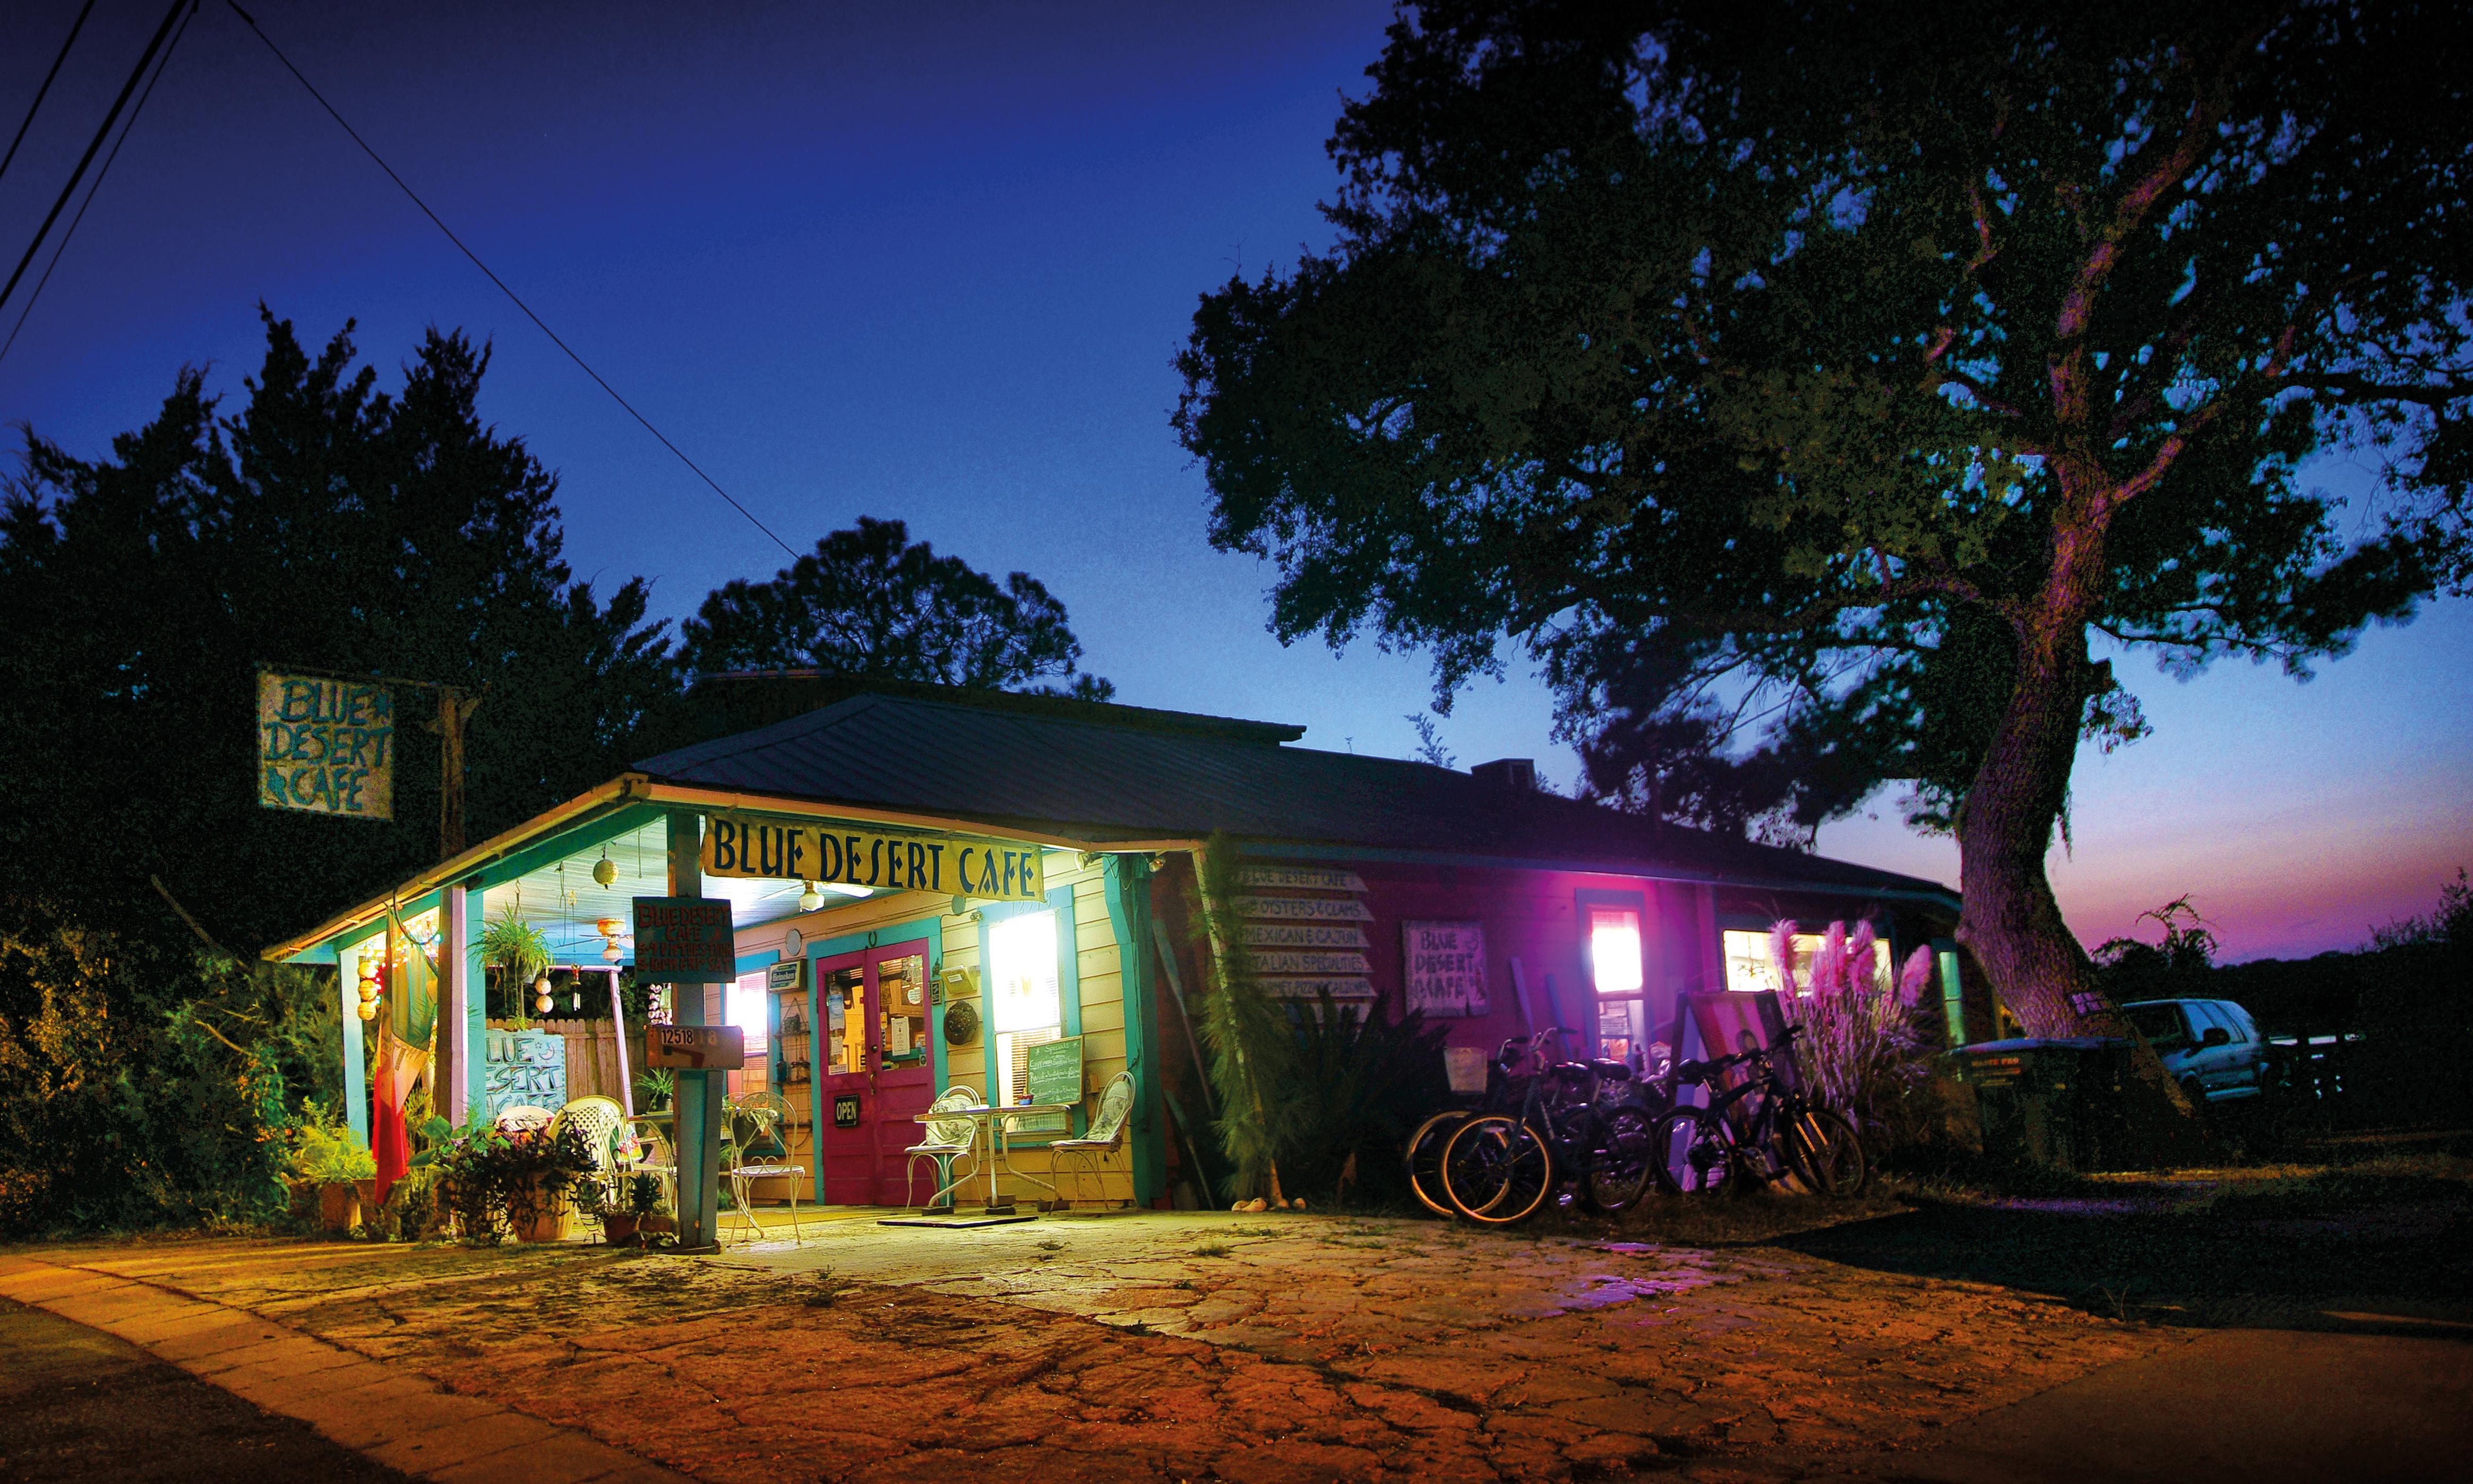 Keys to the backwaters: a coastal Florida road trip